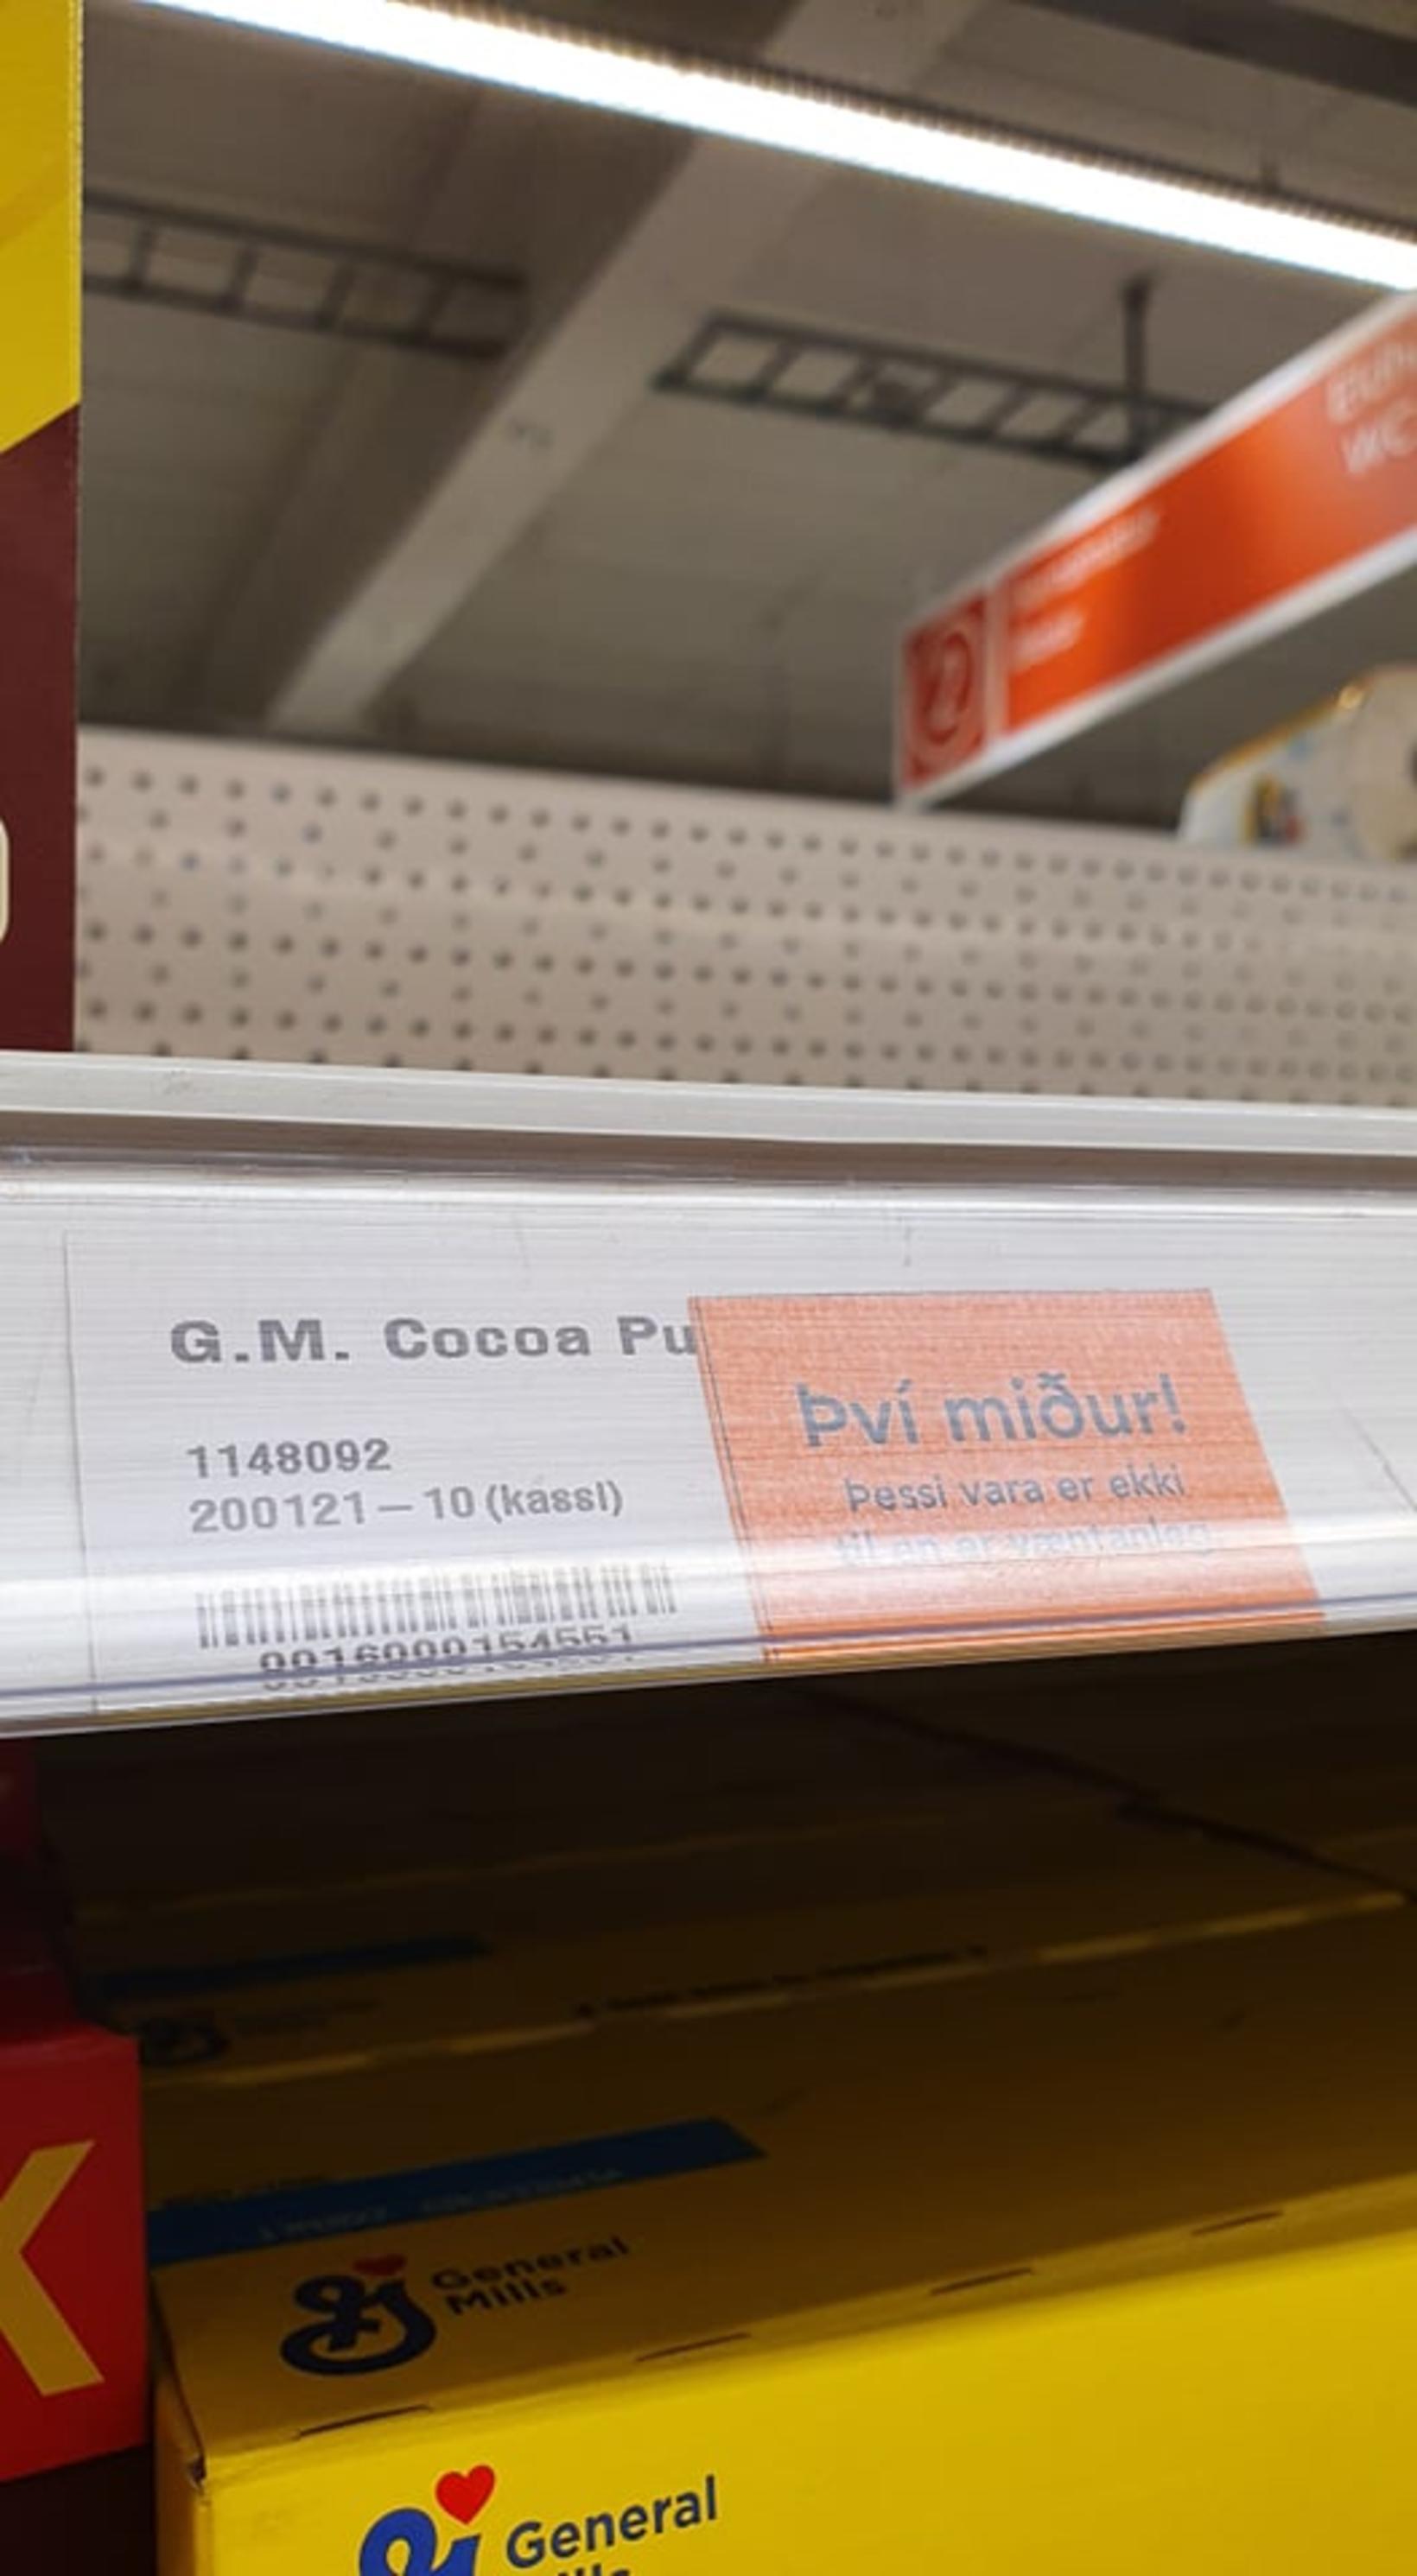 Cocoa Puffs seldist upp í Hagkaupum í Skeifunni.